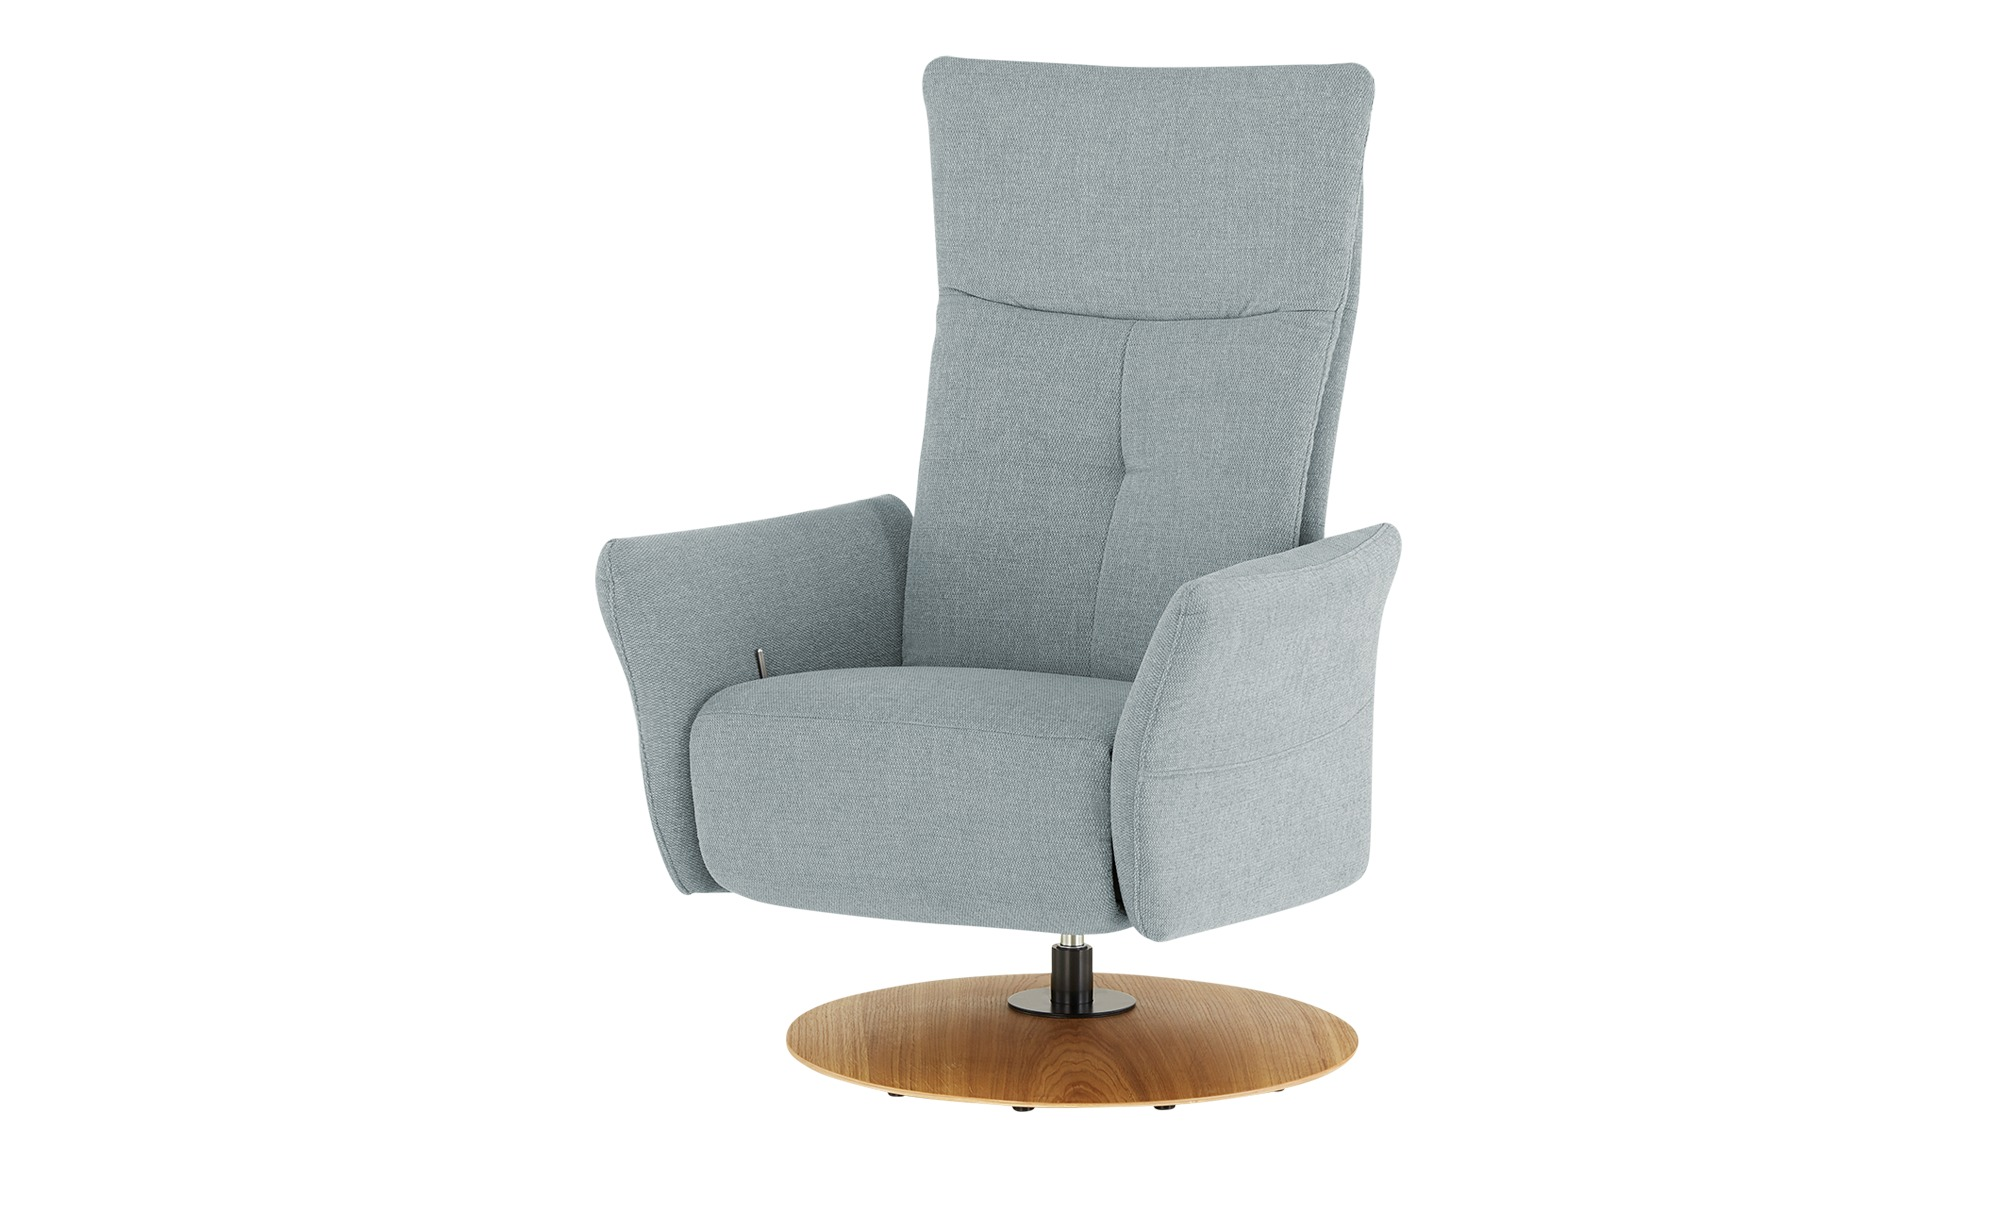 Wohnwert Funktionssessel  Katja ¦ grau ¦ Maße (cm): B: 79 H: 114 T: 80 Polstermöbel > Sessel > Drehsessel - Höffner